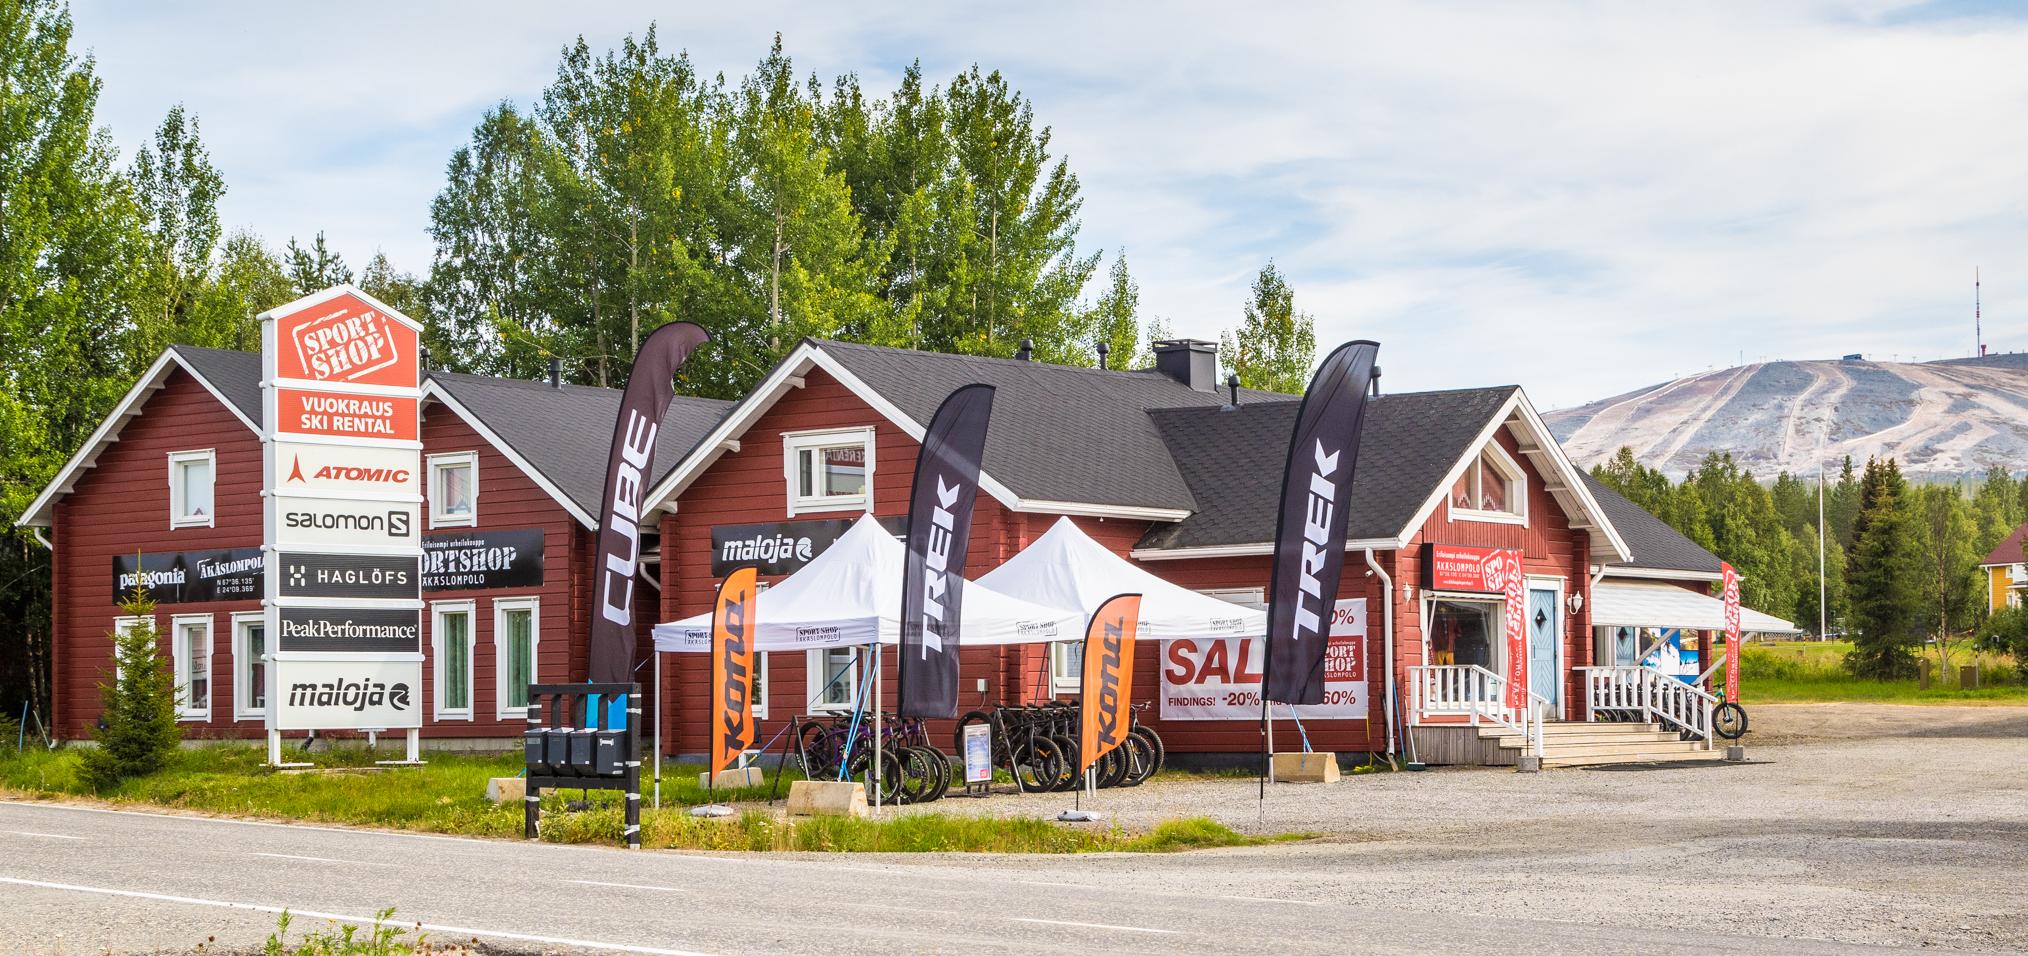 Rentle helped Äkäslompolo Sportshop in doubling their revenue